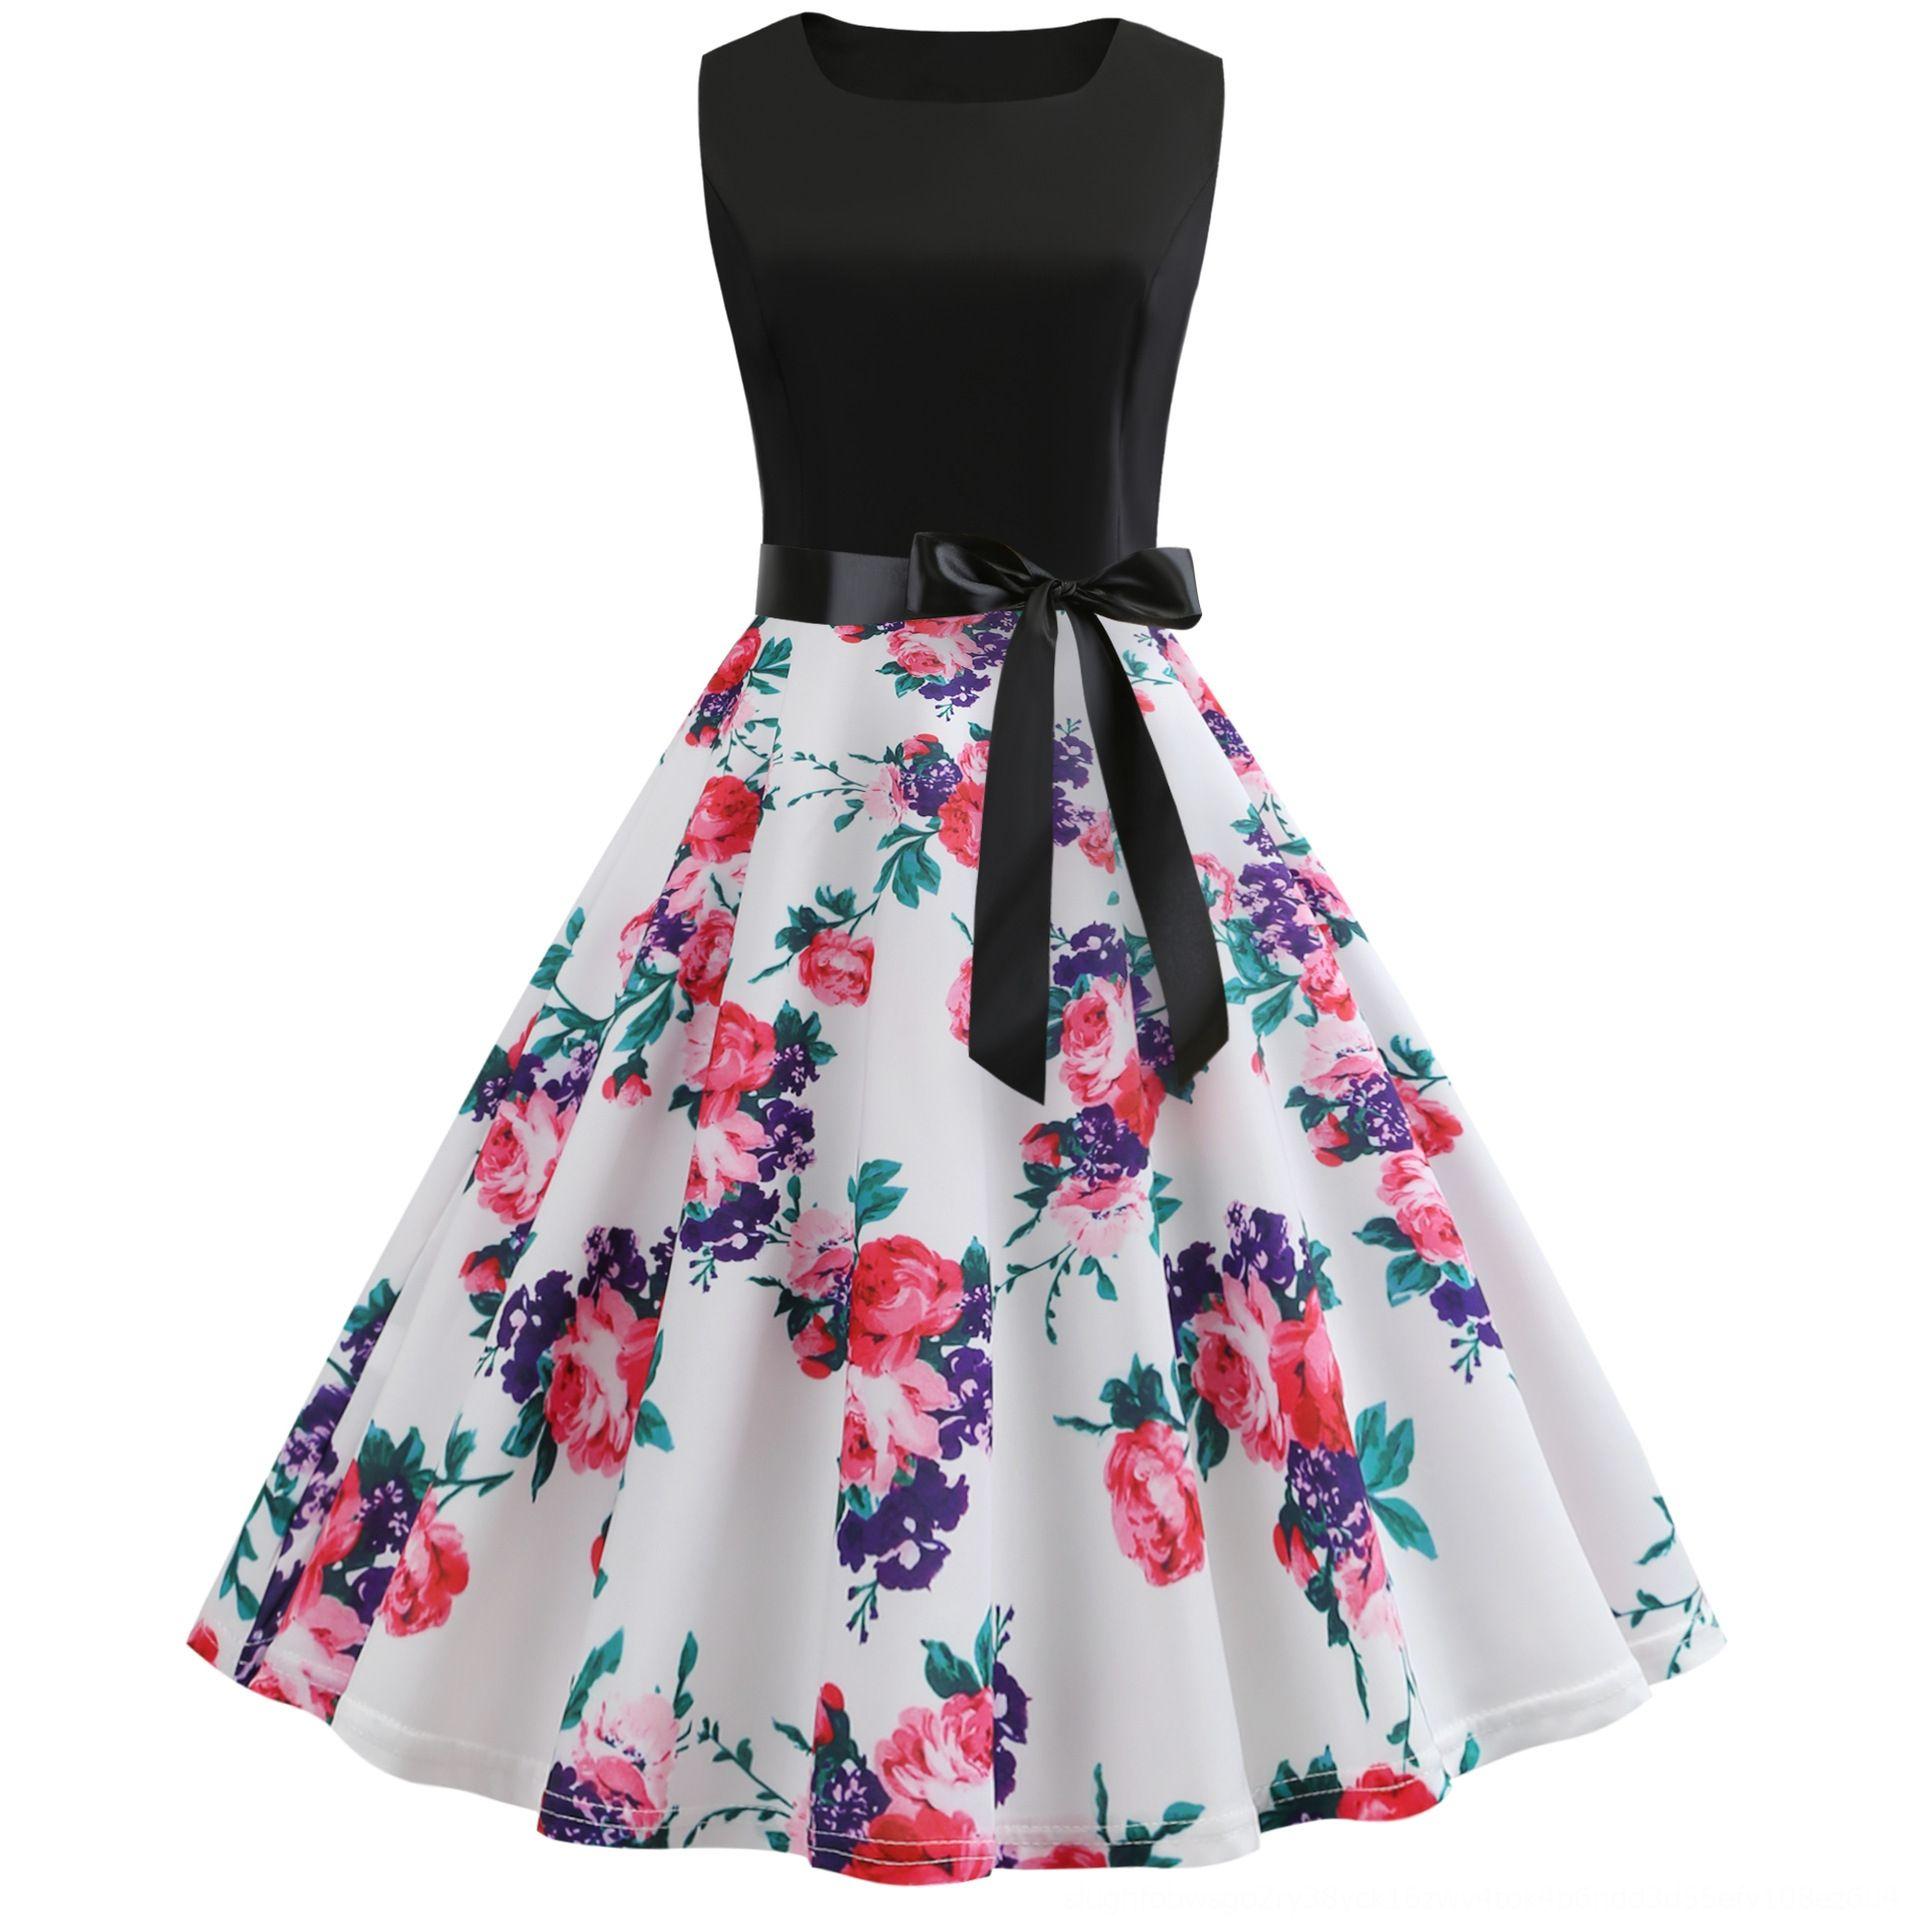 taille grand swing de style de MGnbX 2019 imprimé taille grand swing sans manches Hepburn style robe robe imprimé 2019 Hepburn